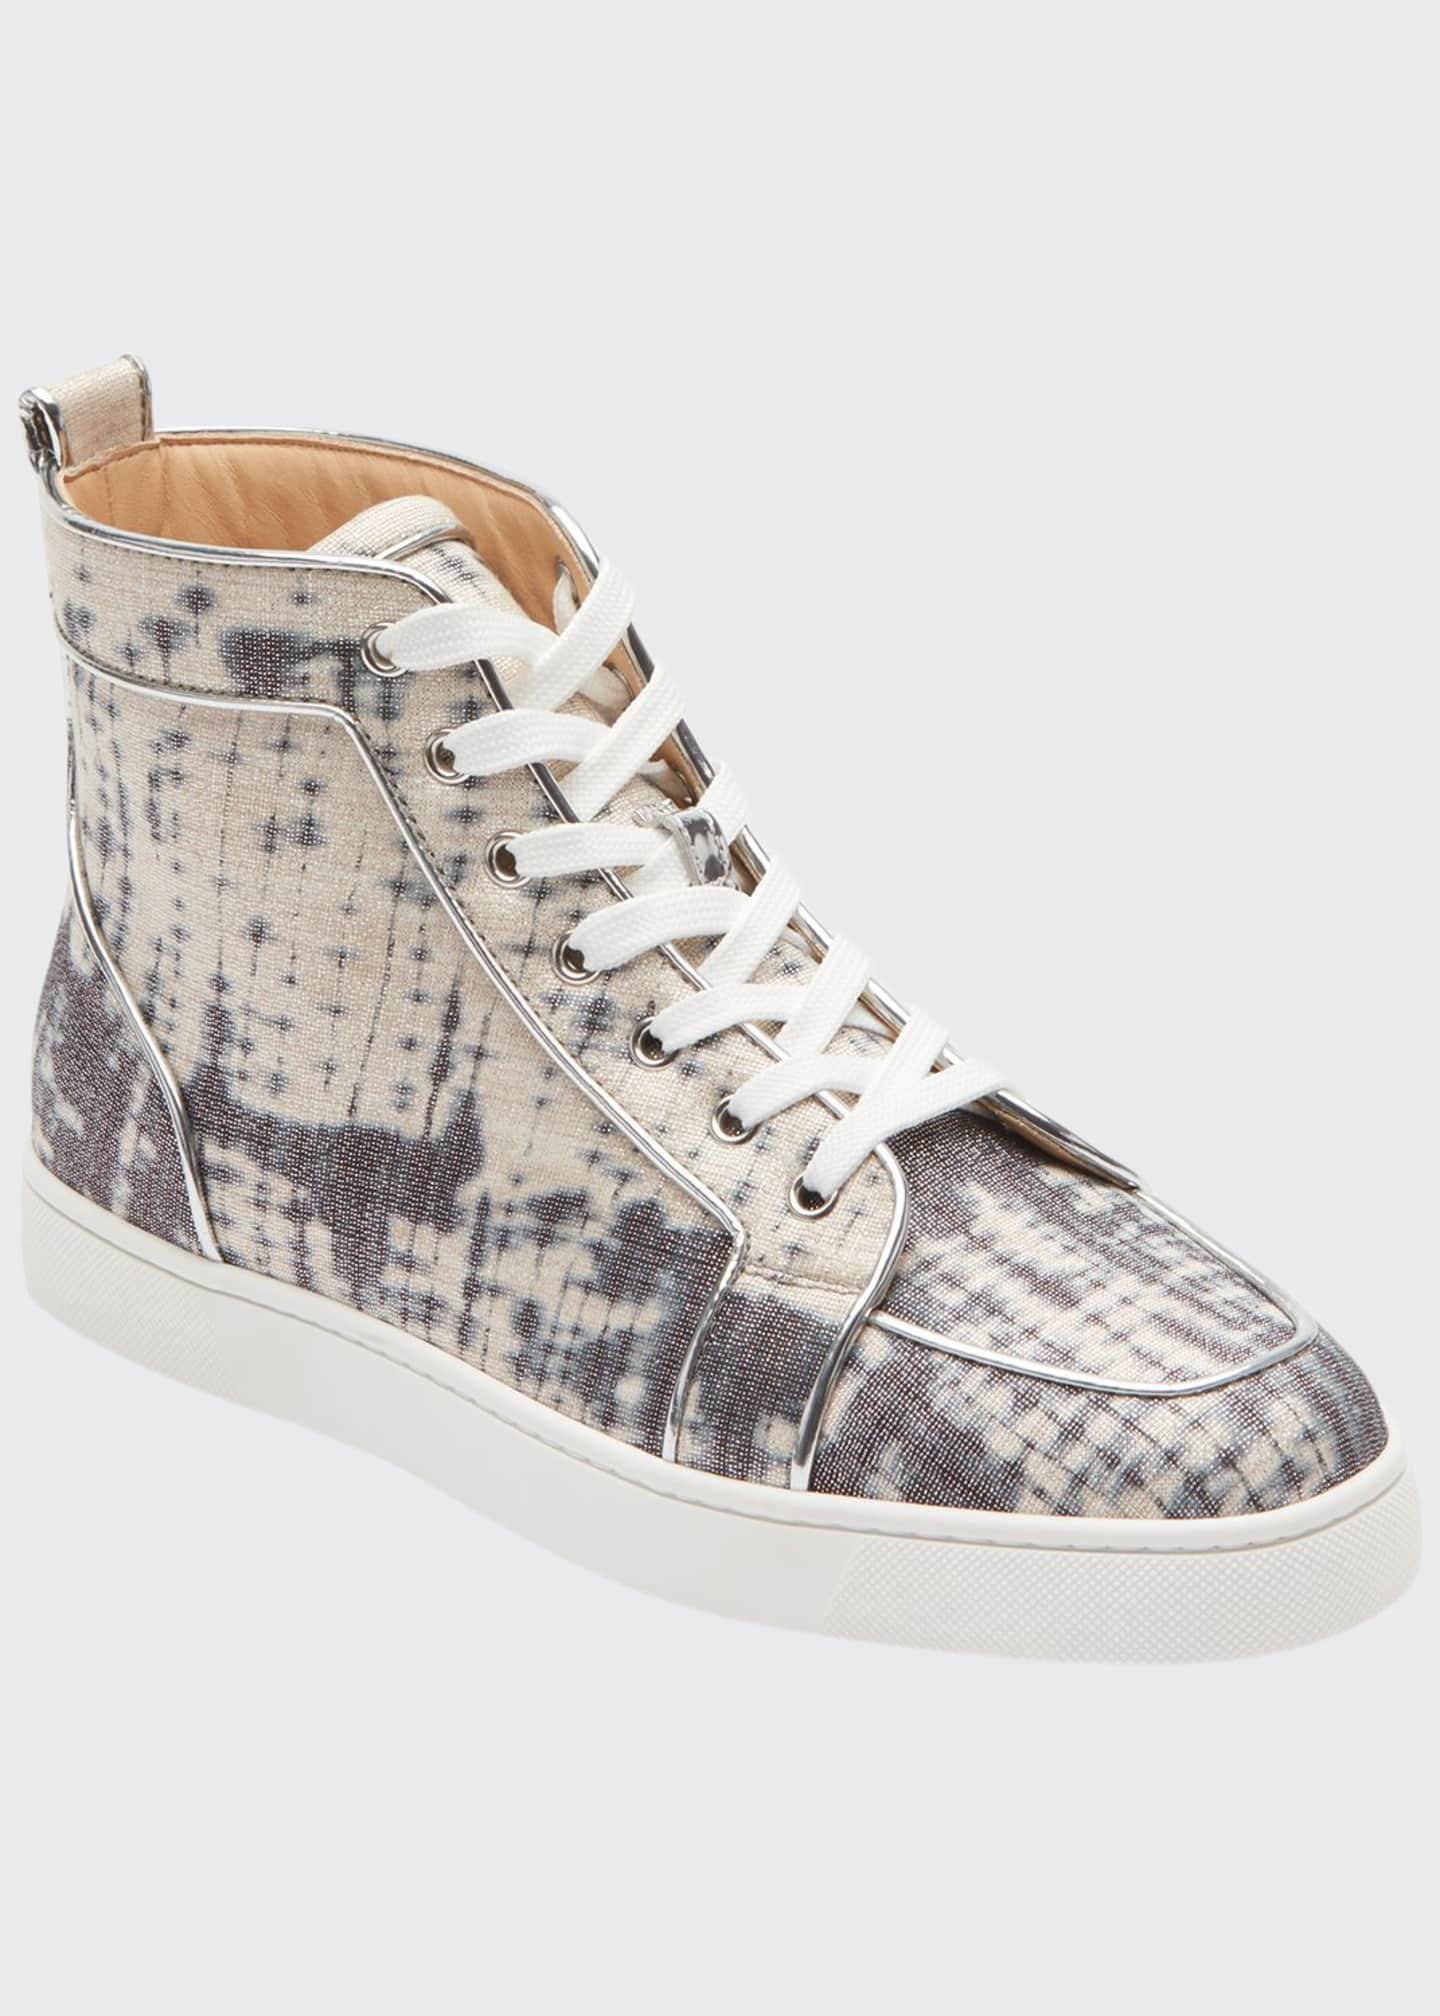 Christian Louboutin Men's Rantus Tie-Dye Linen High-Top Sneakers